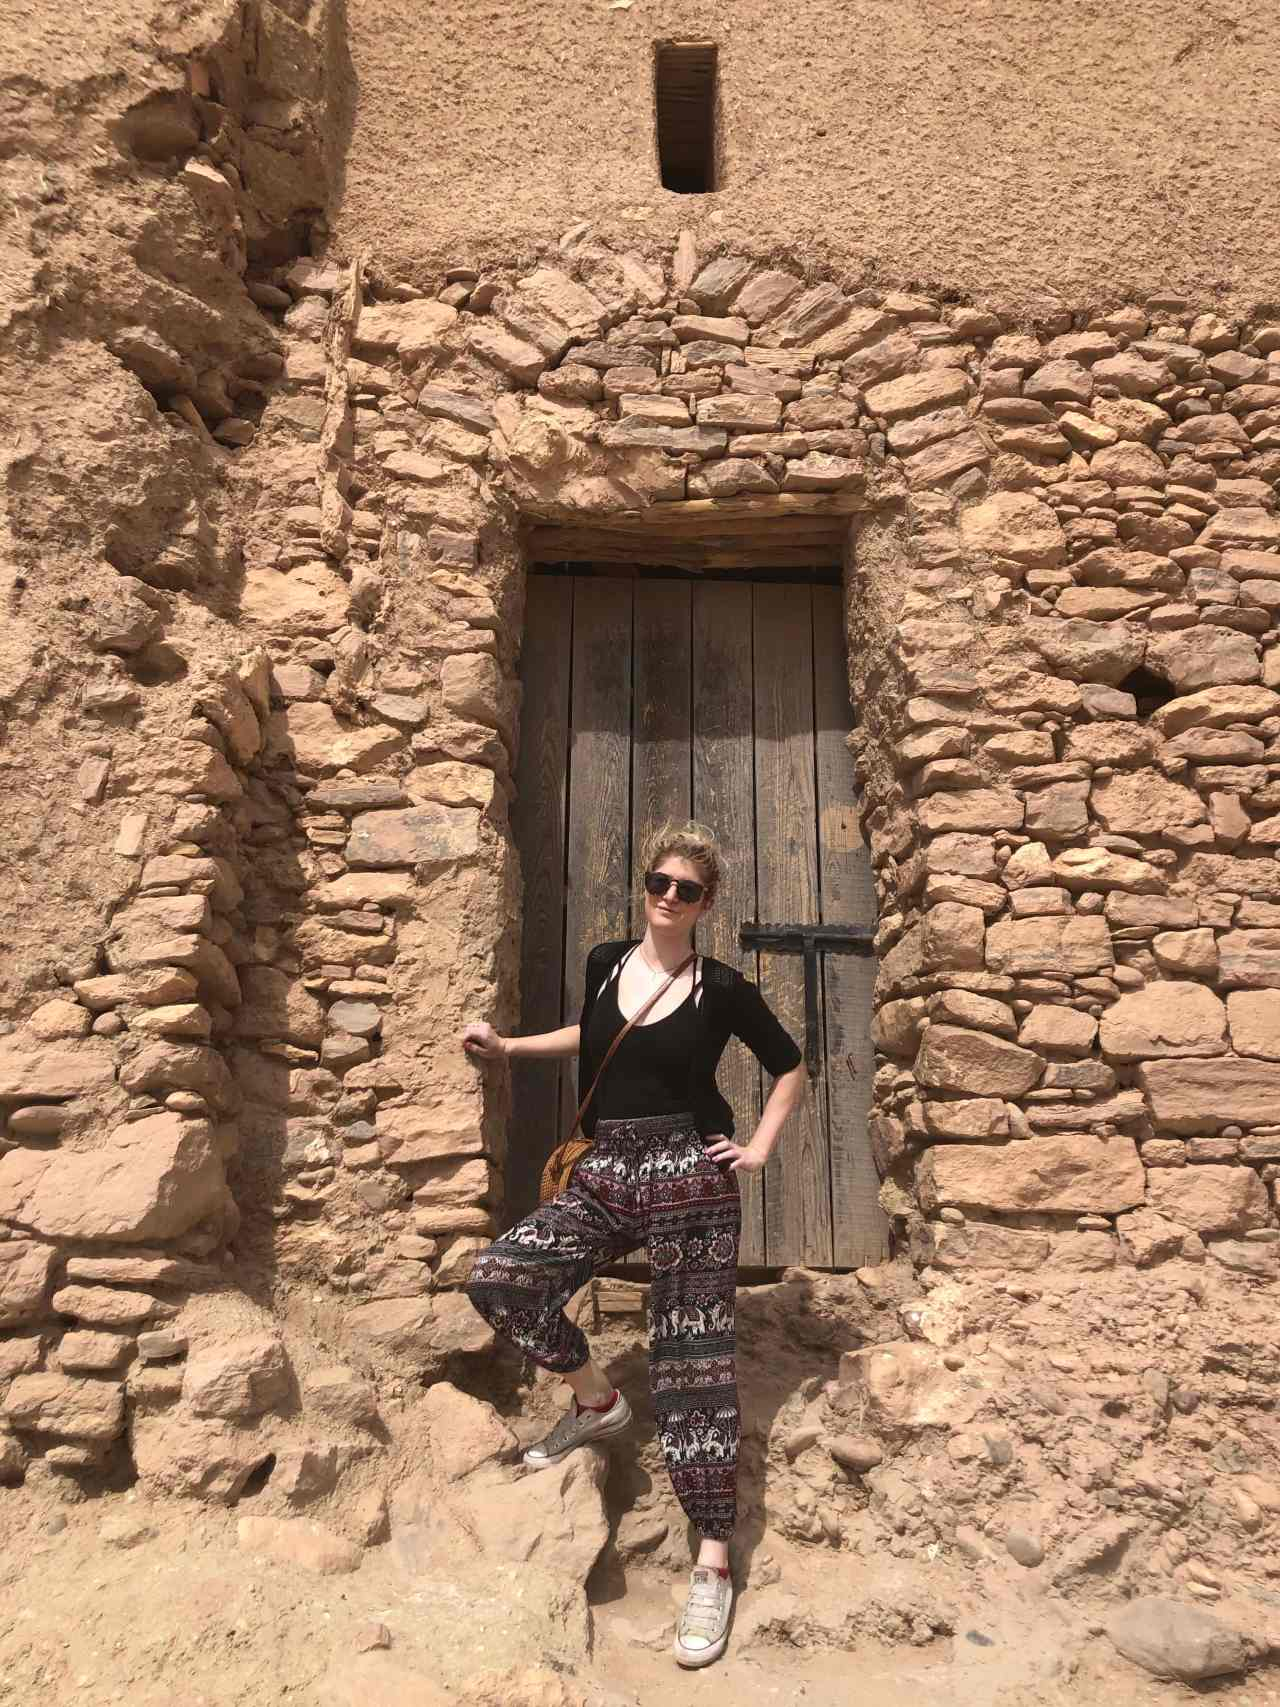 Ancient city of Ait benhaddou